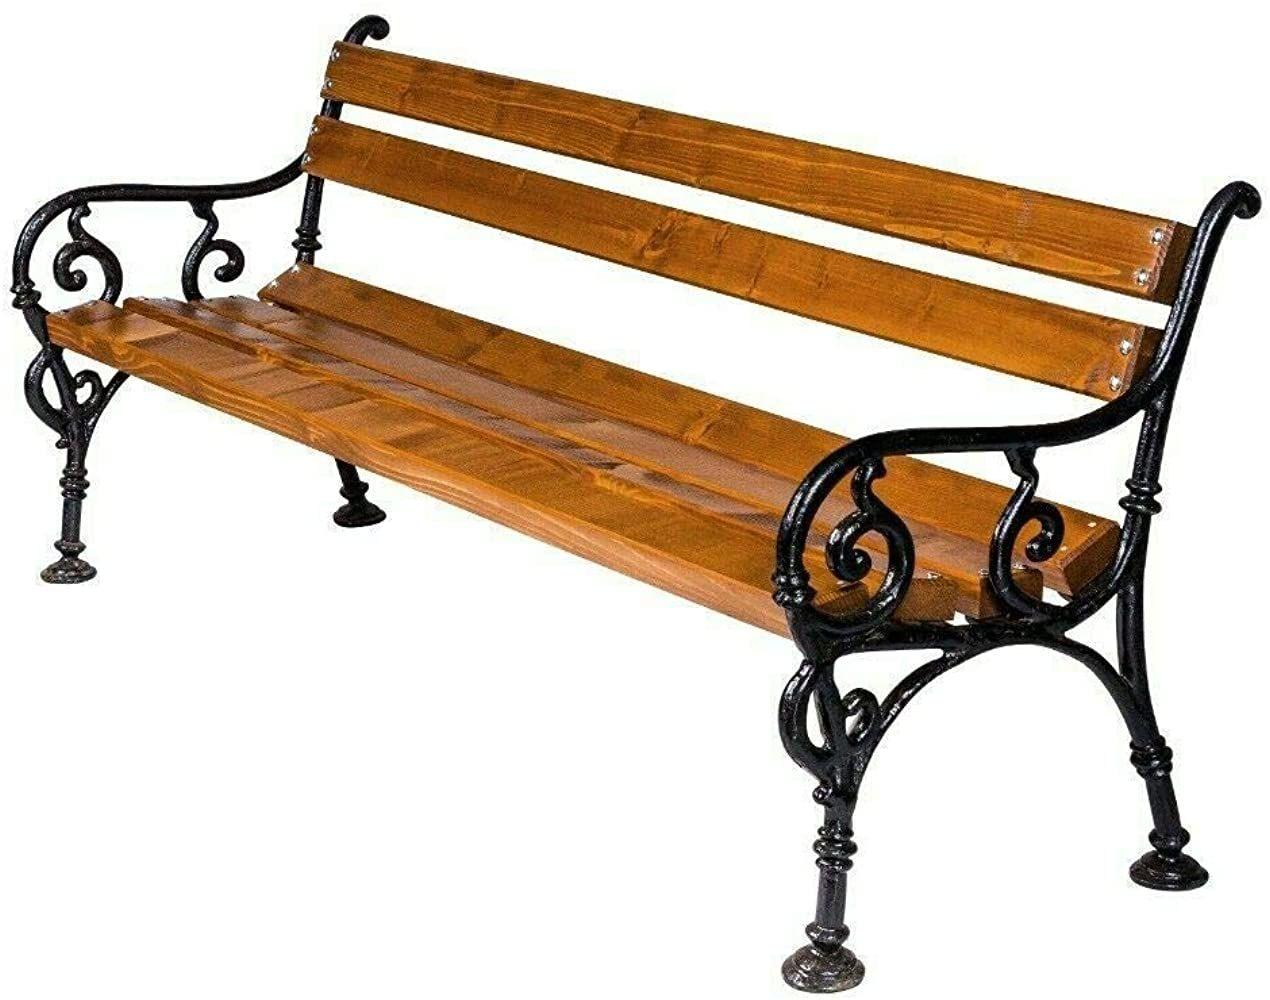 Naka24 Parkbank Gartenbank Gestell Massivholz Kiefer 160 Cm 01150